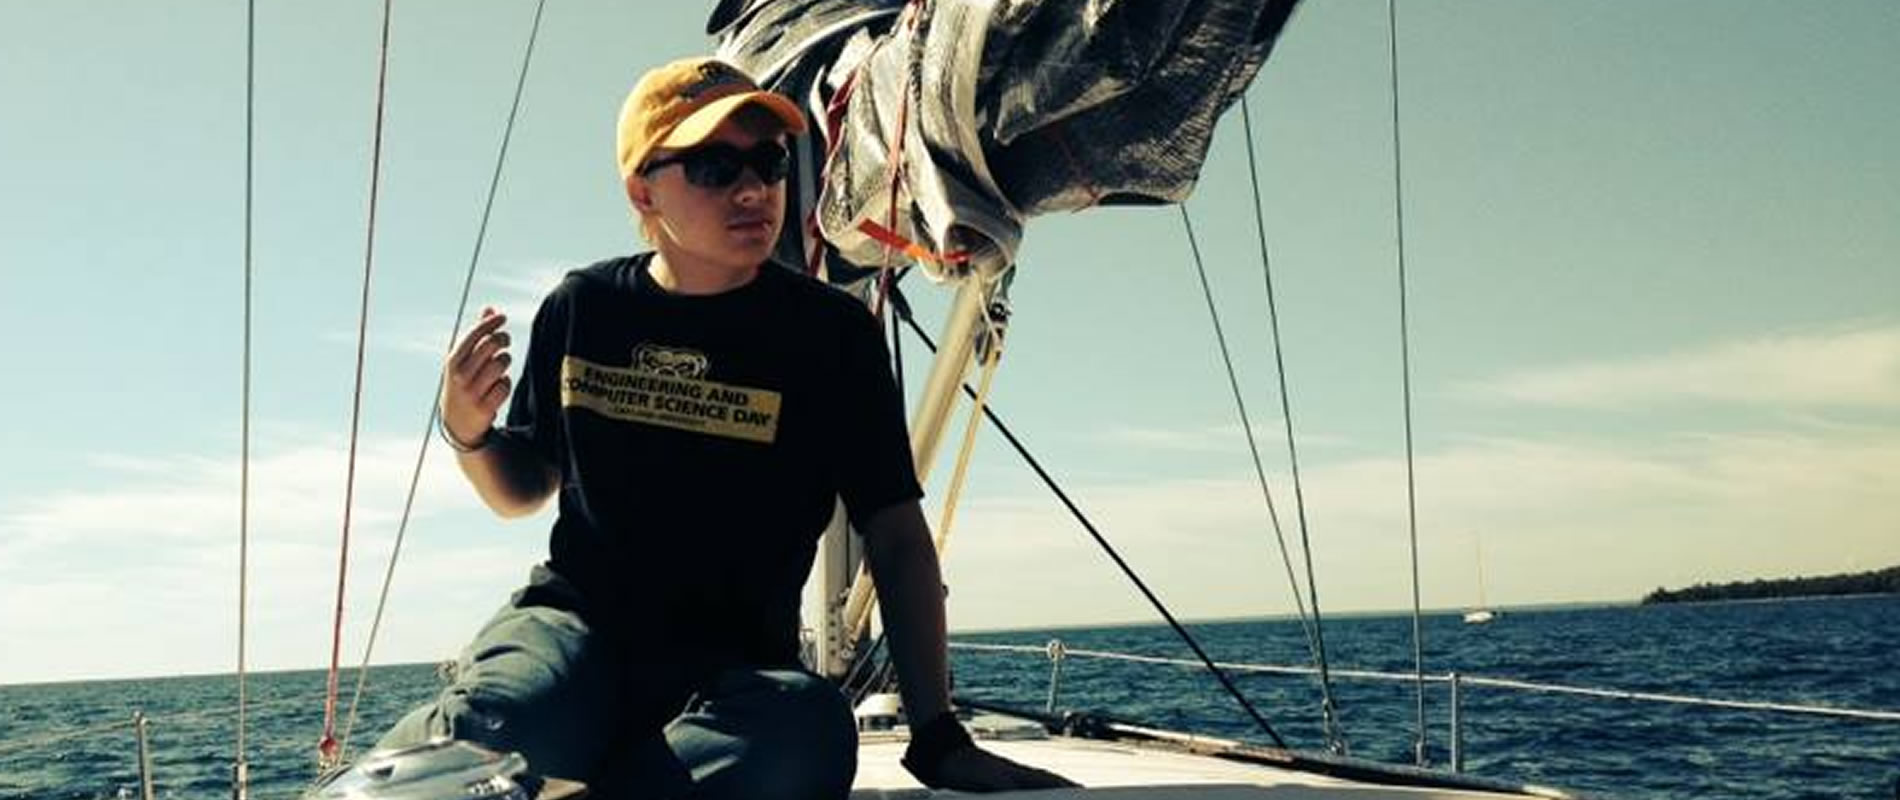 Set Sail for Autism